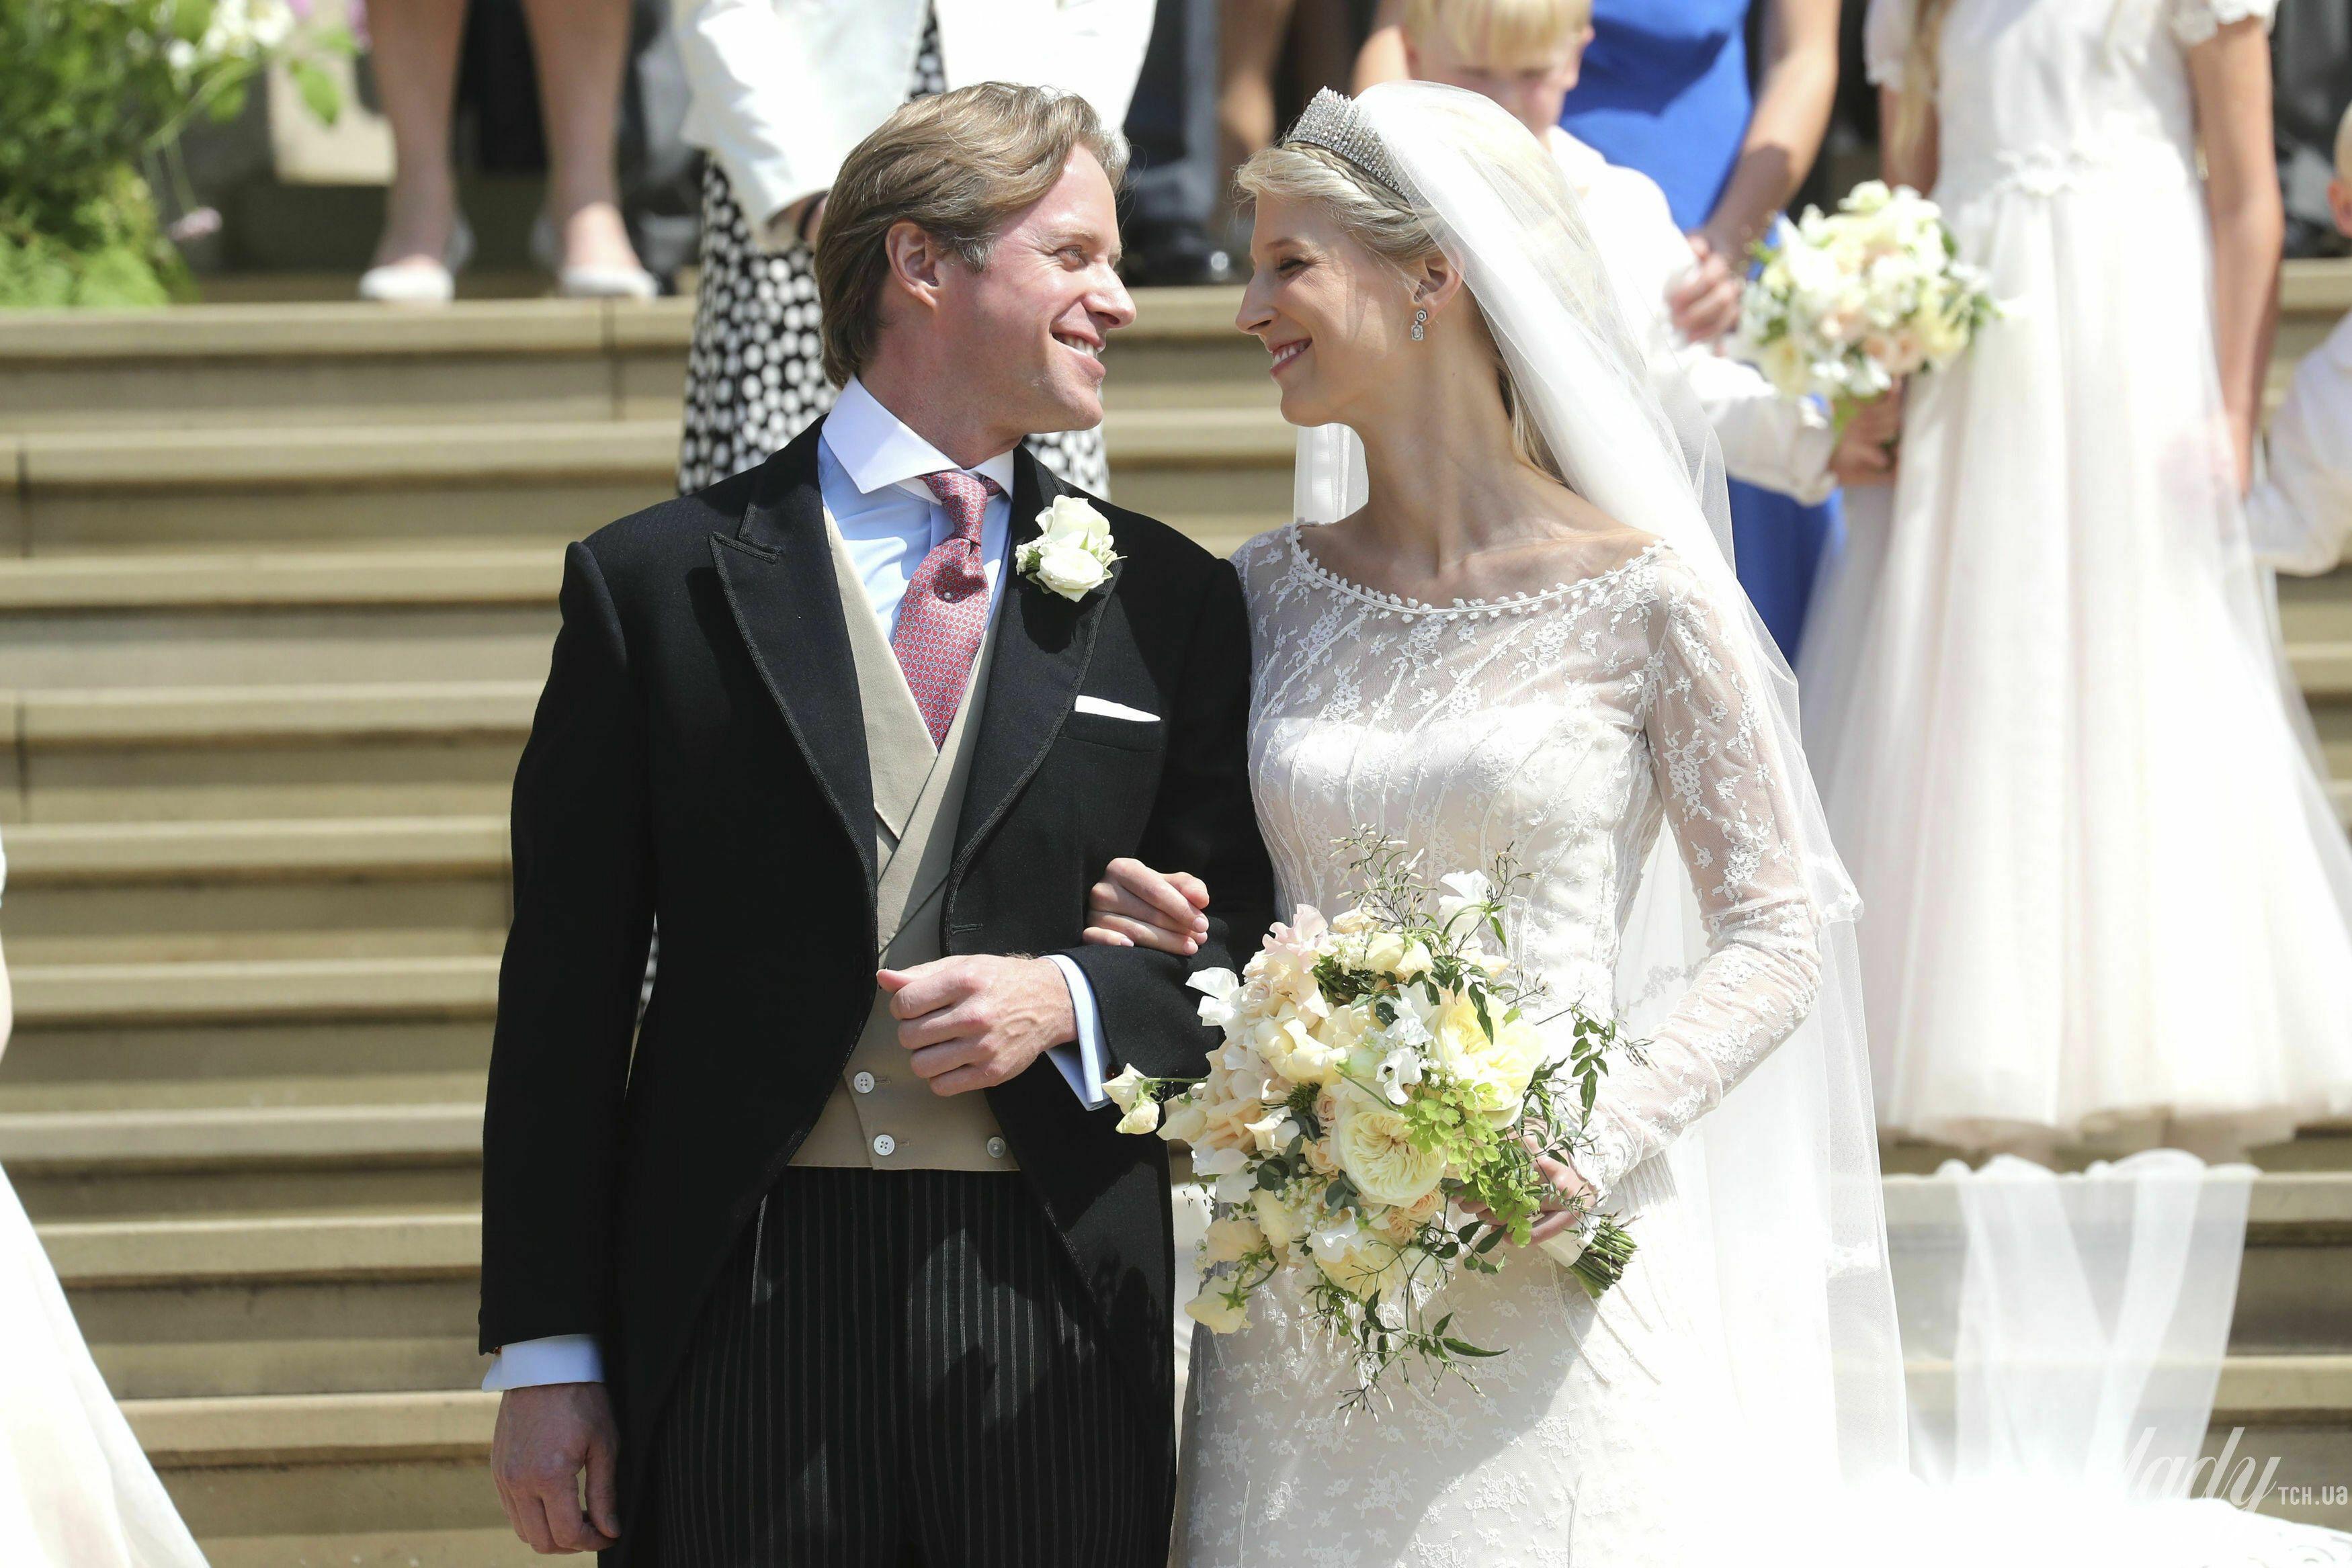 Свадьба леди Габриэллы Виндзор и Томаса Кингстона_9